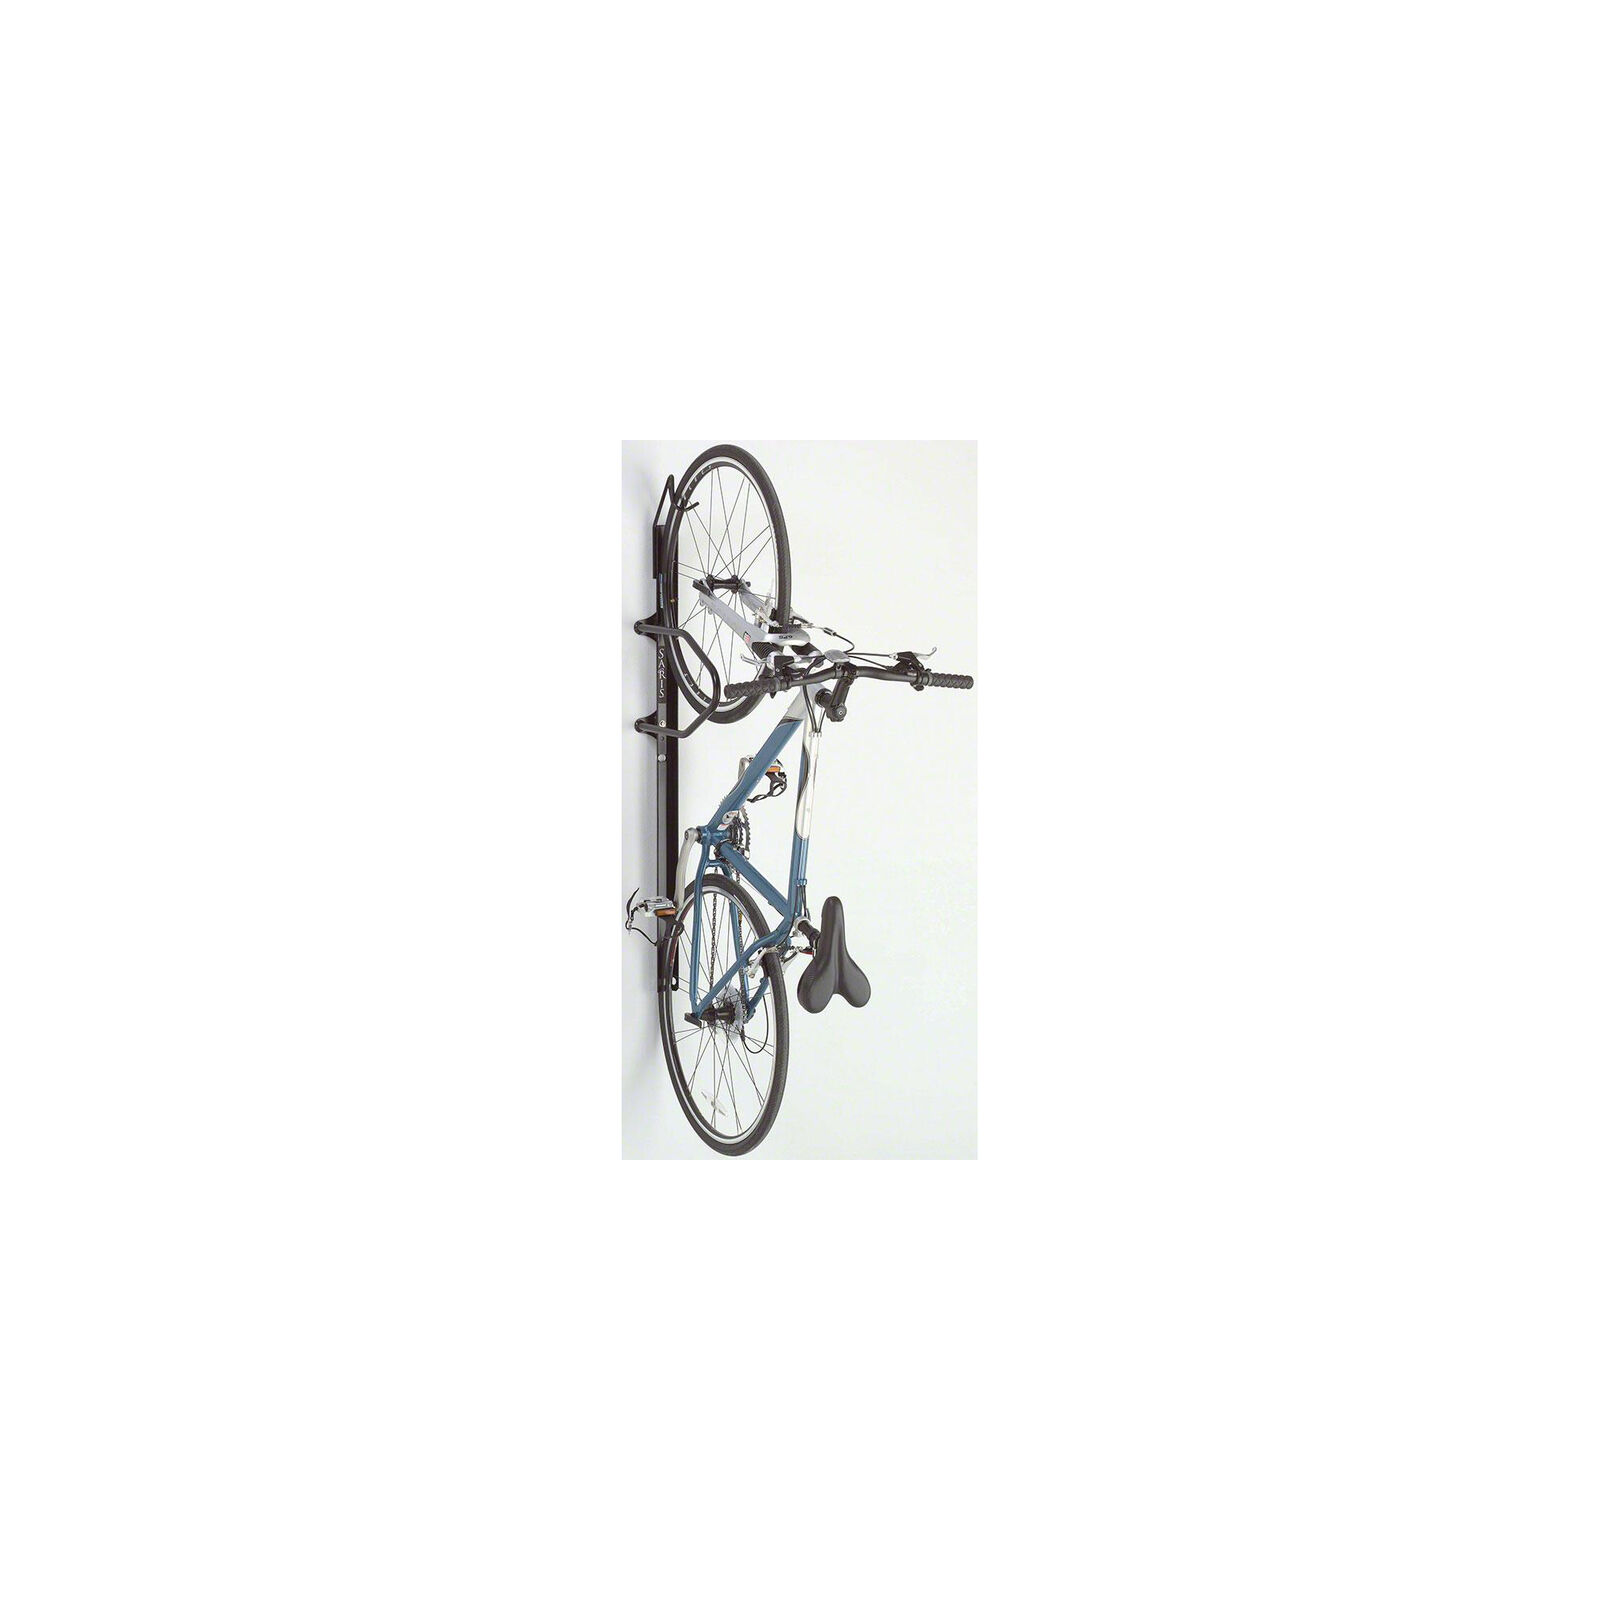 Saris 6006 Bicicleta Trac de bloqueo